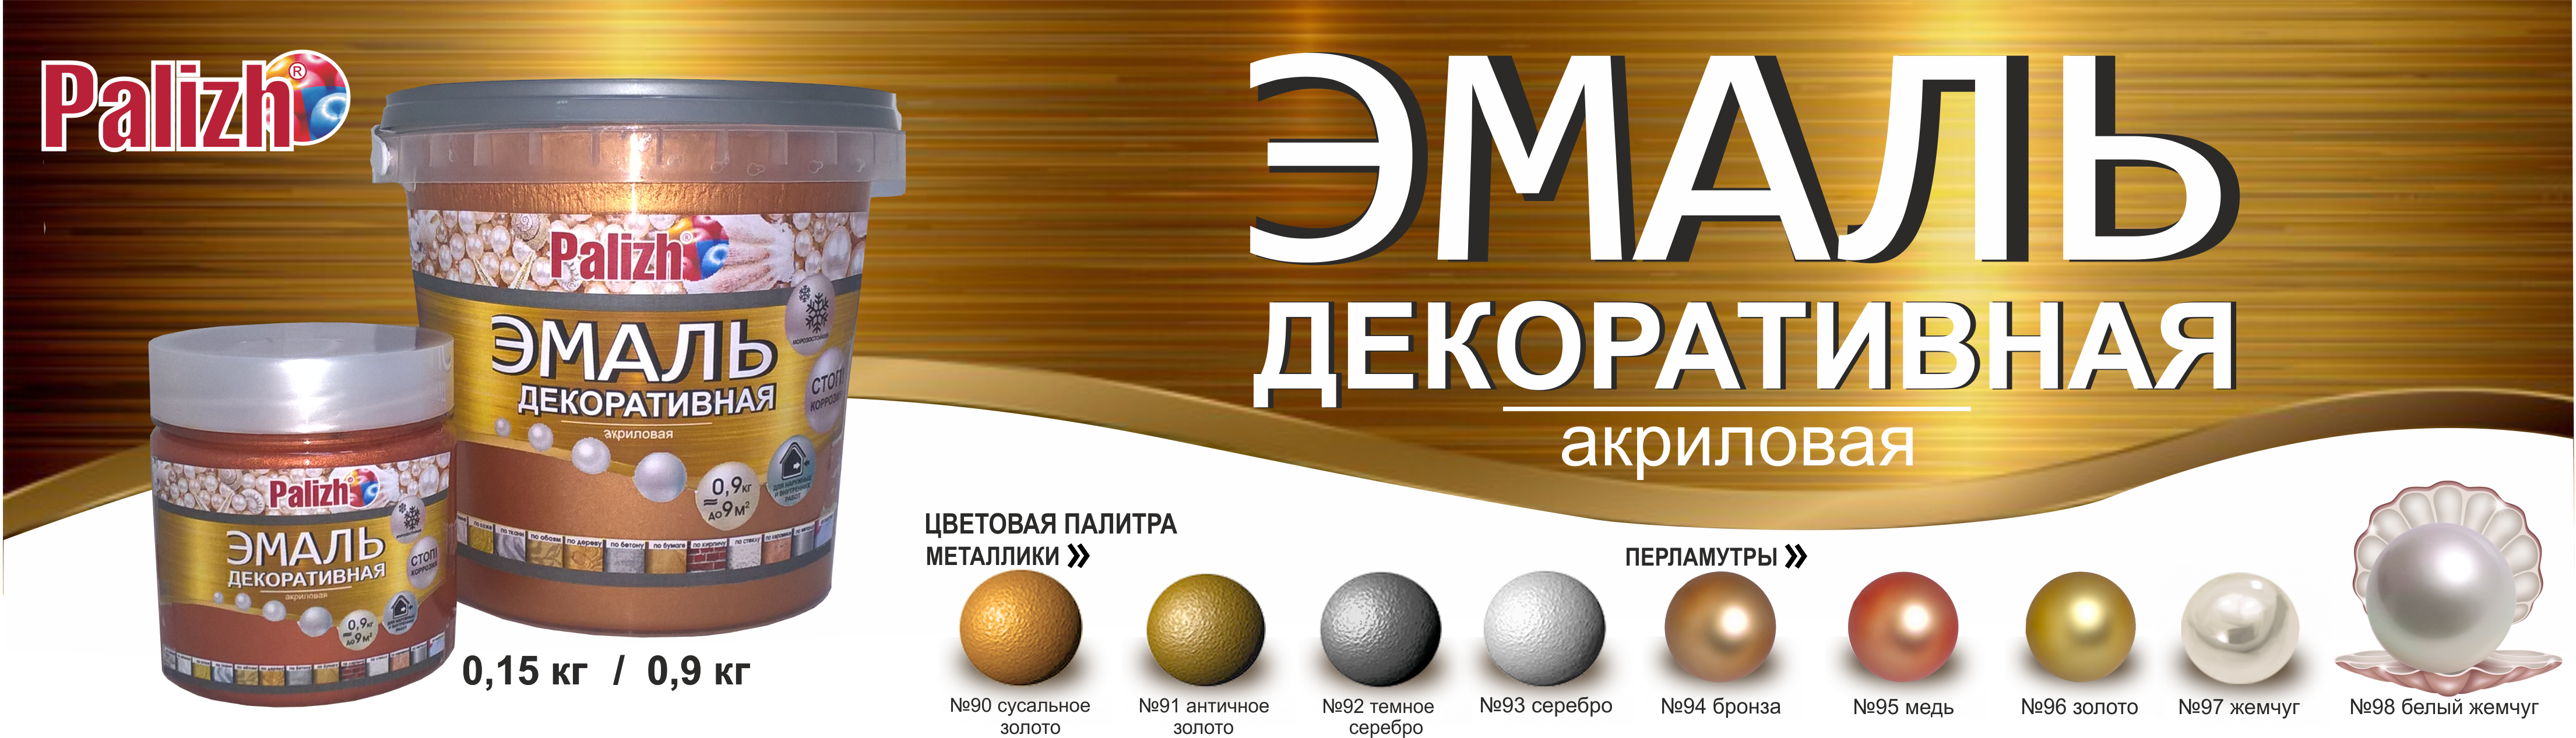 Emal_dekorativnaya